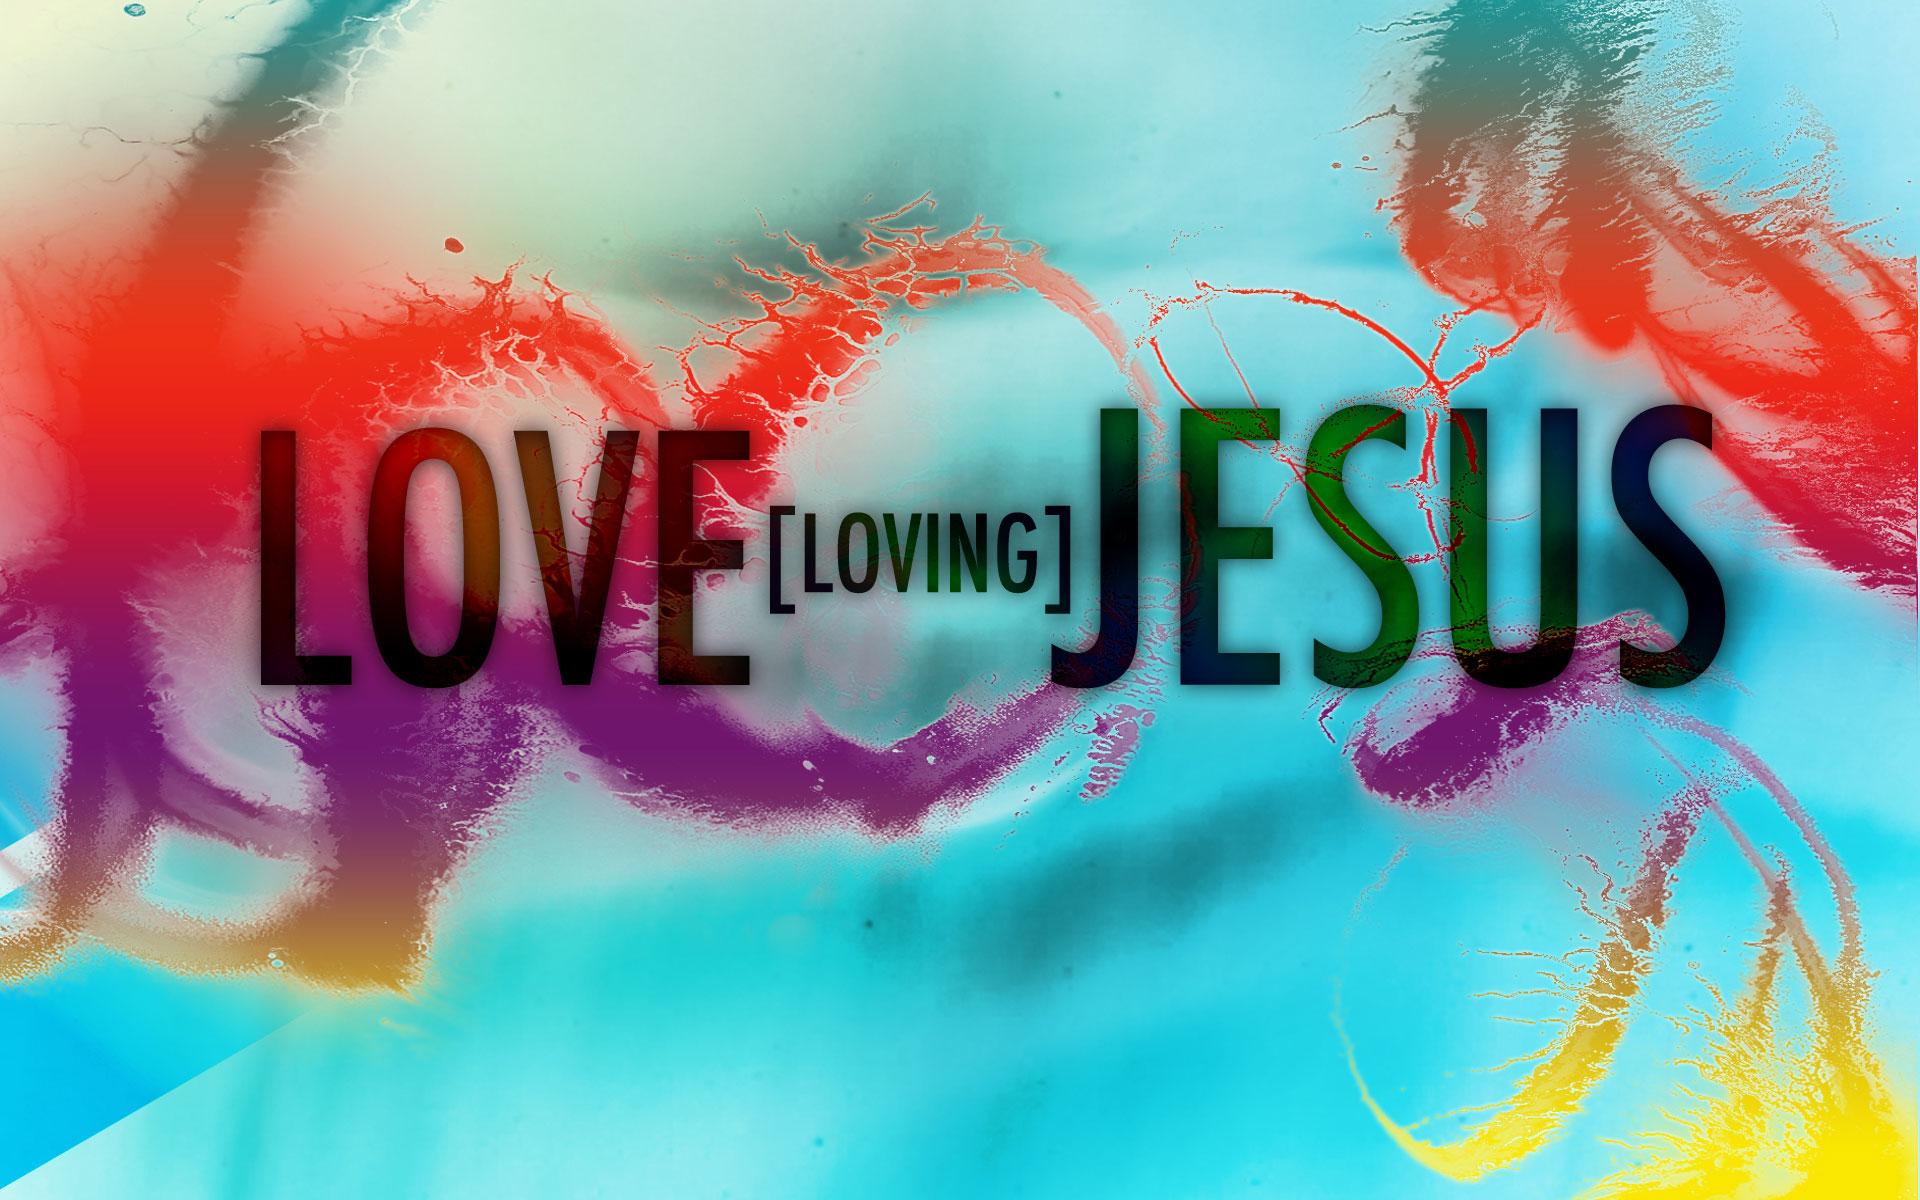 wallpaper cristiano evangelico my christian Love Loving Jesus 1920x1200